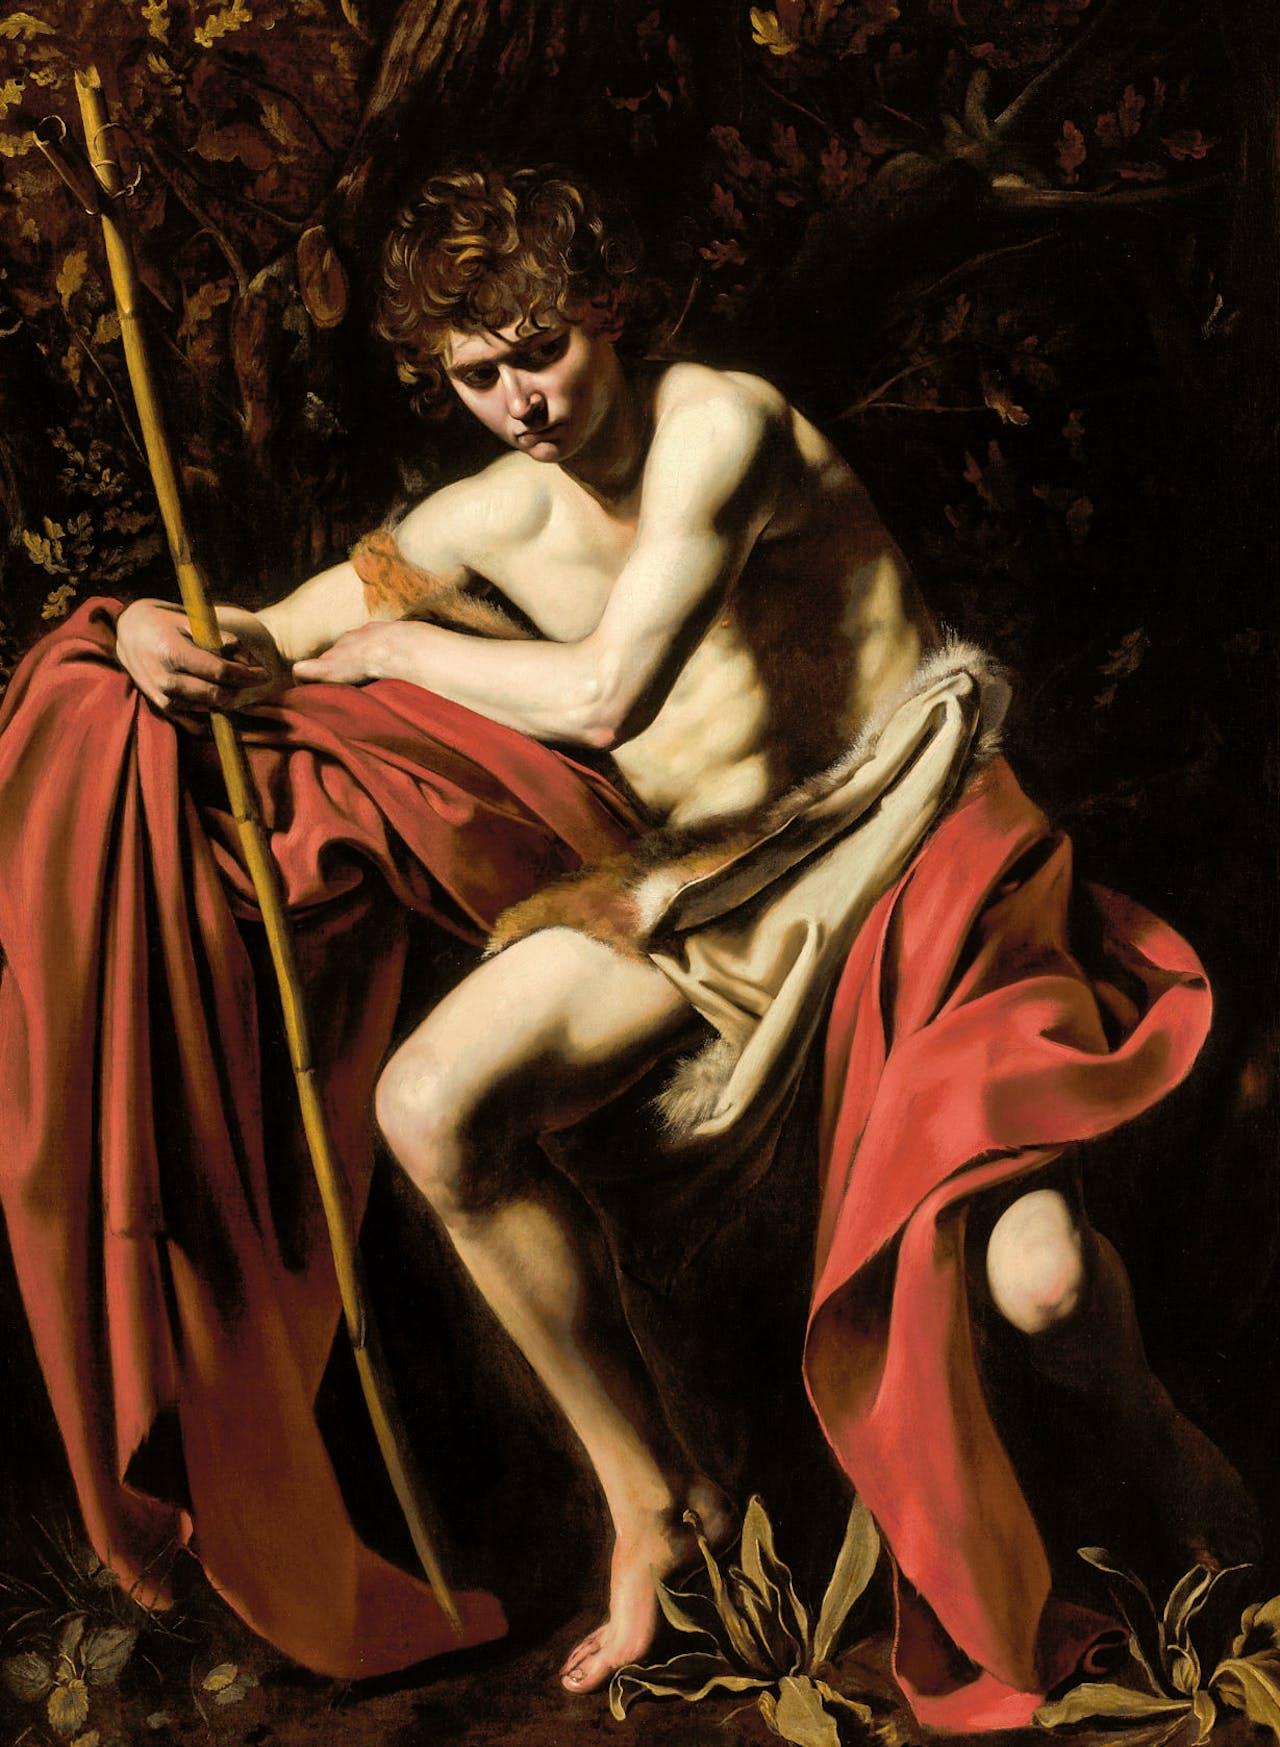 Caravaggio: 'Johannes de Doper in de wildernis', ca. 1604.